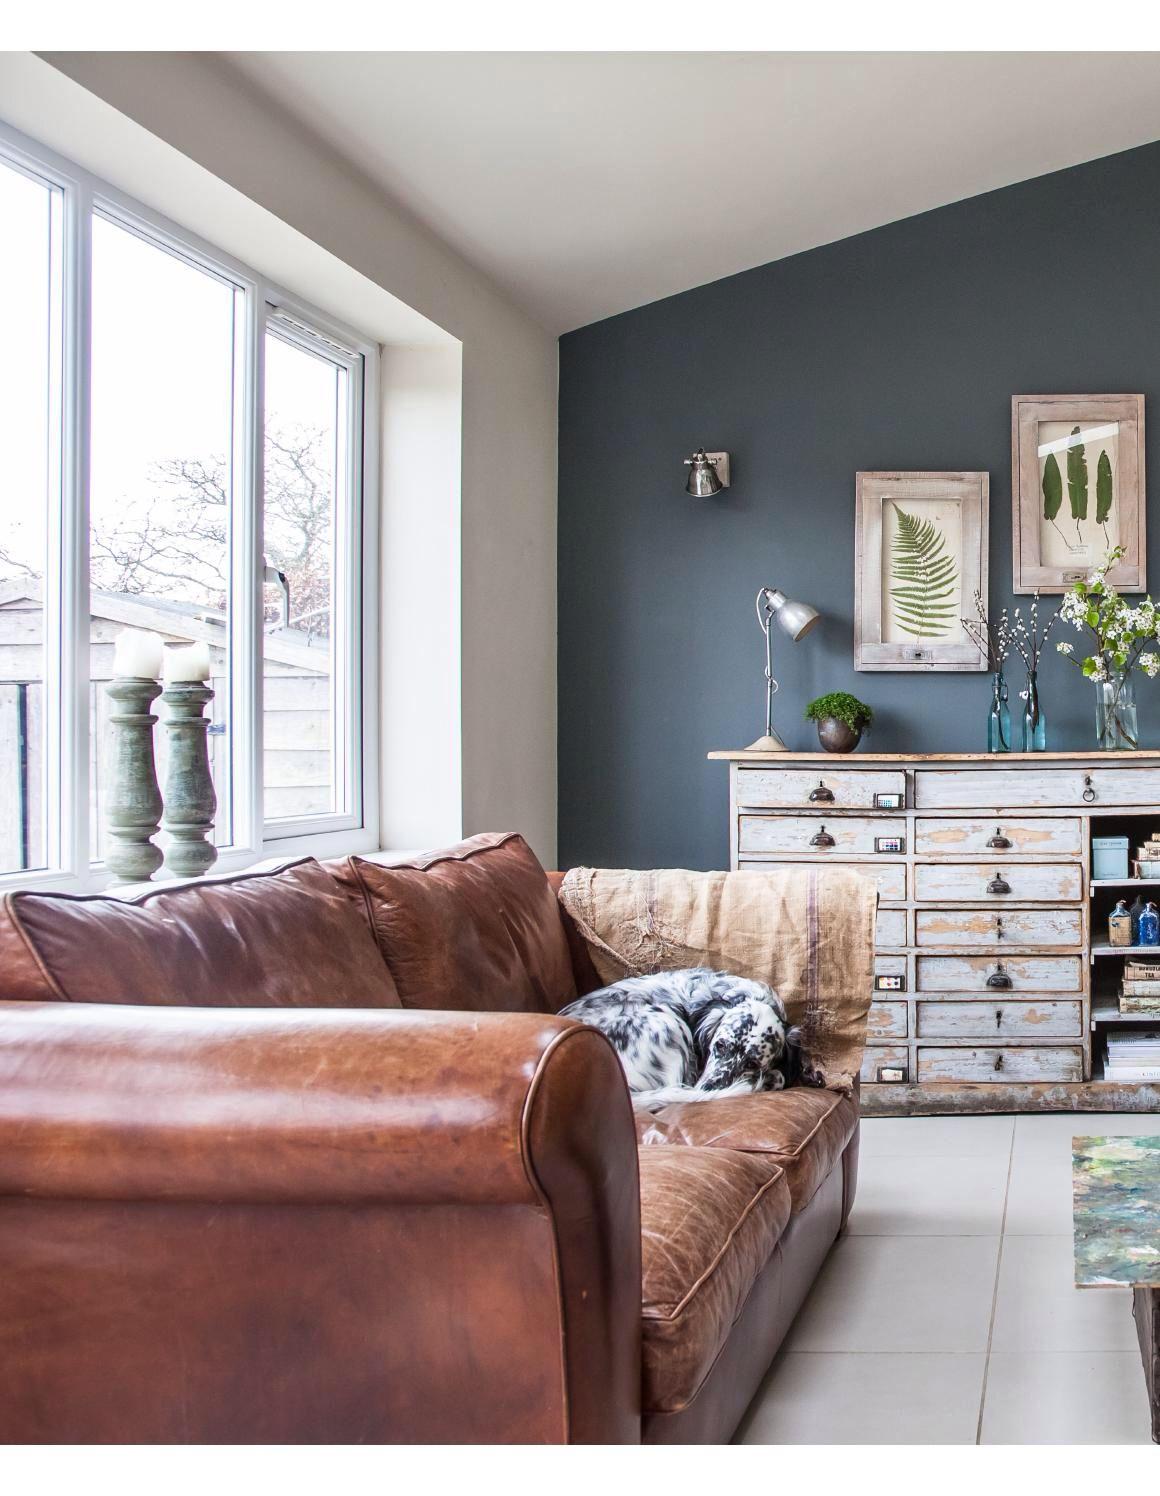 Pin by Greta Wesslen on living room | Pinterest | Living rooms ...